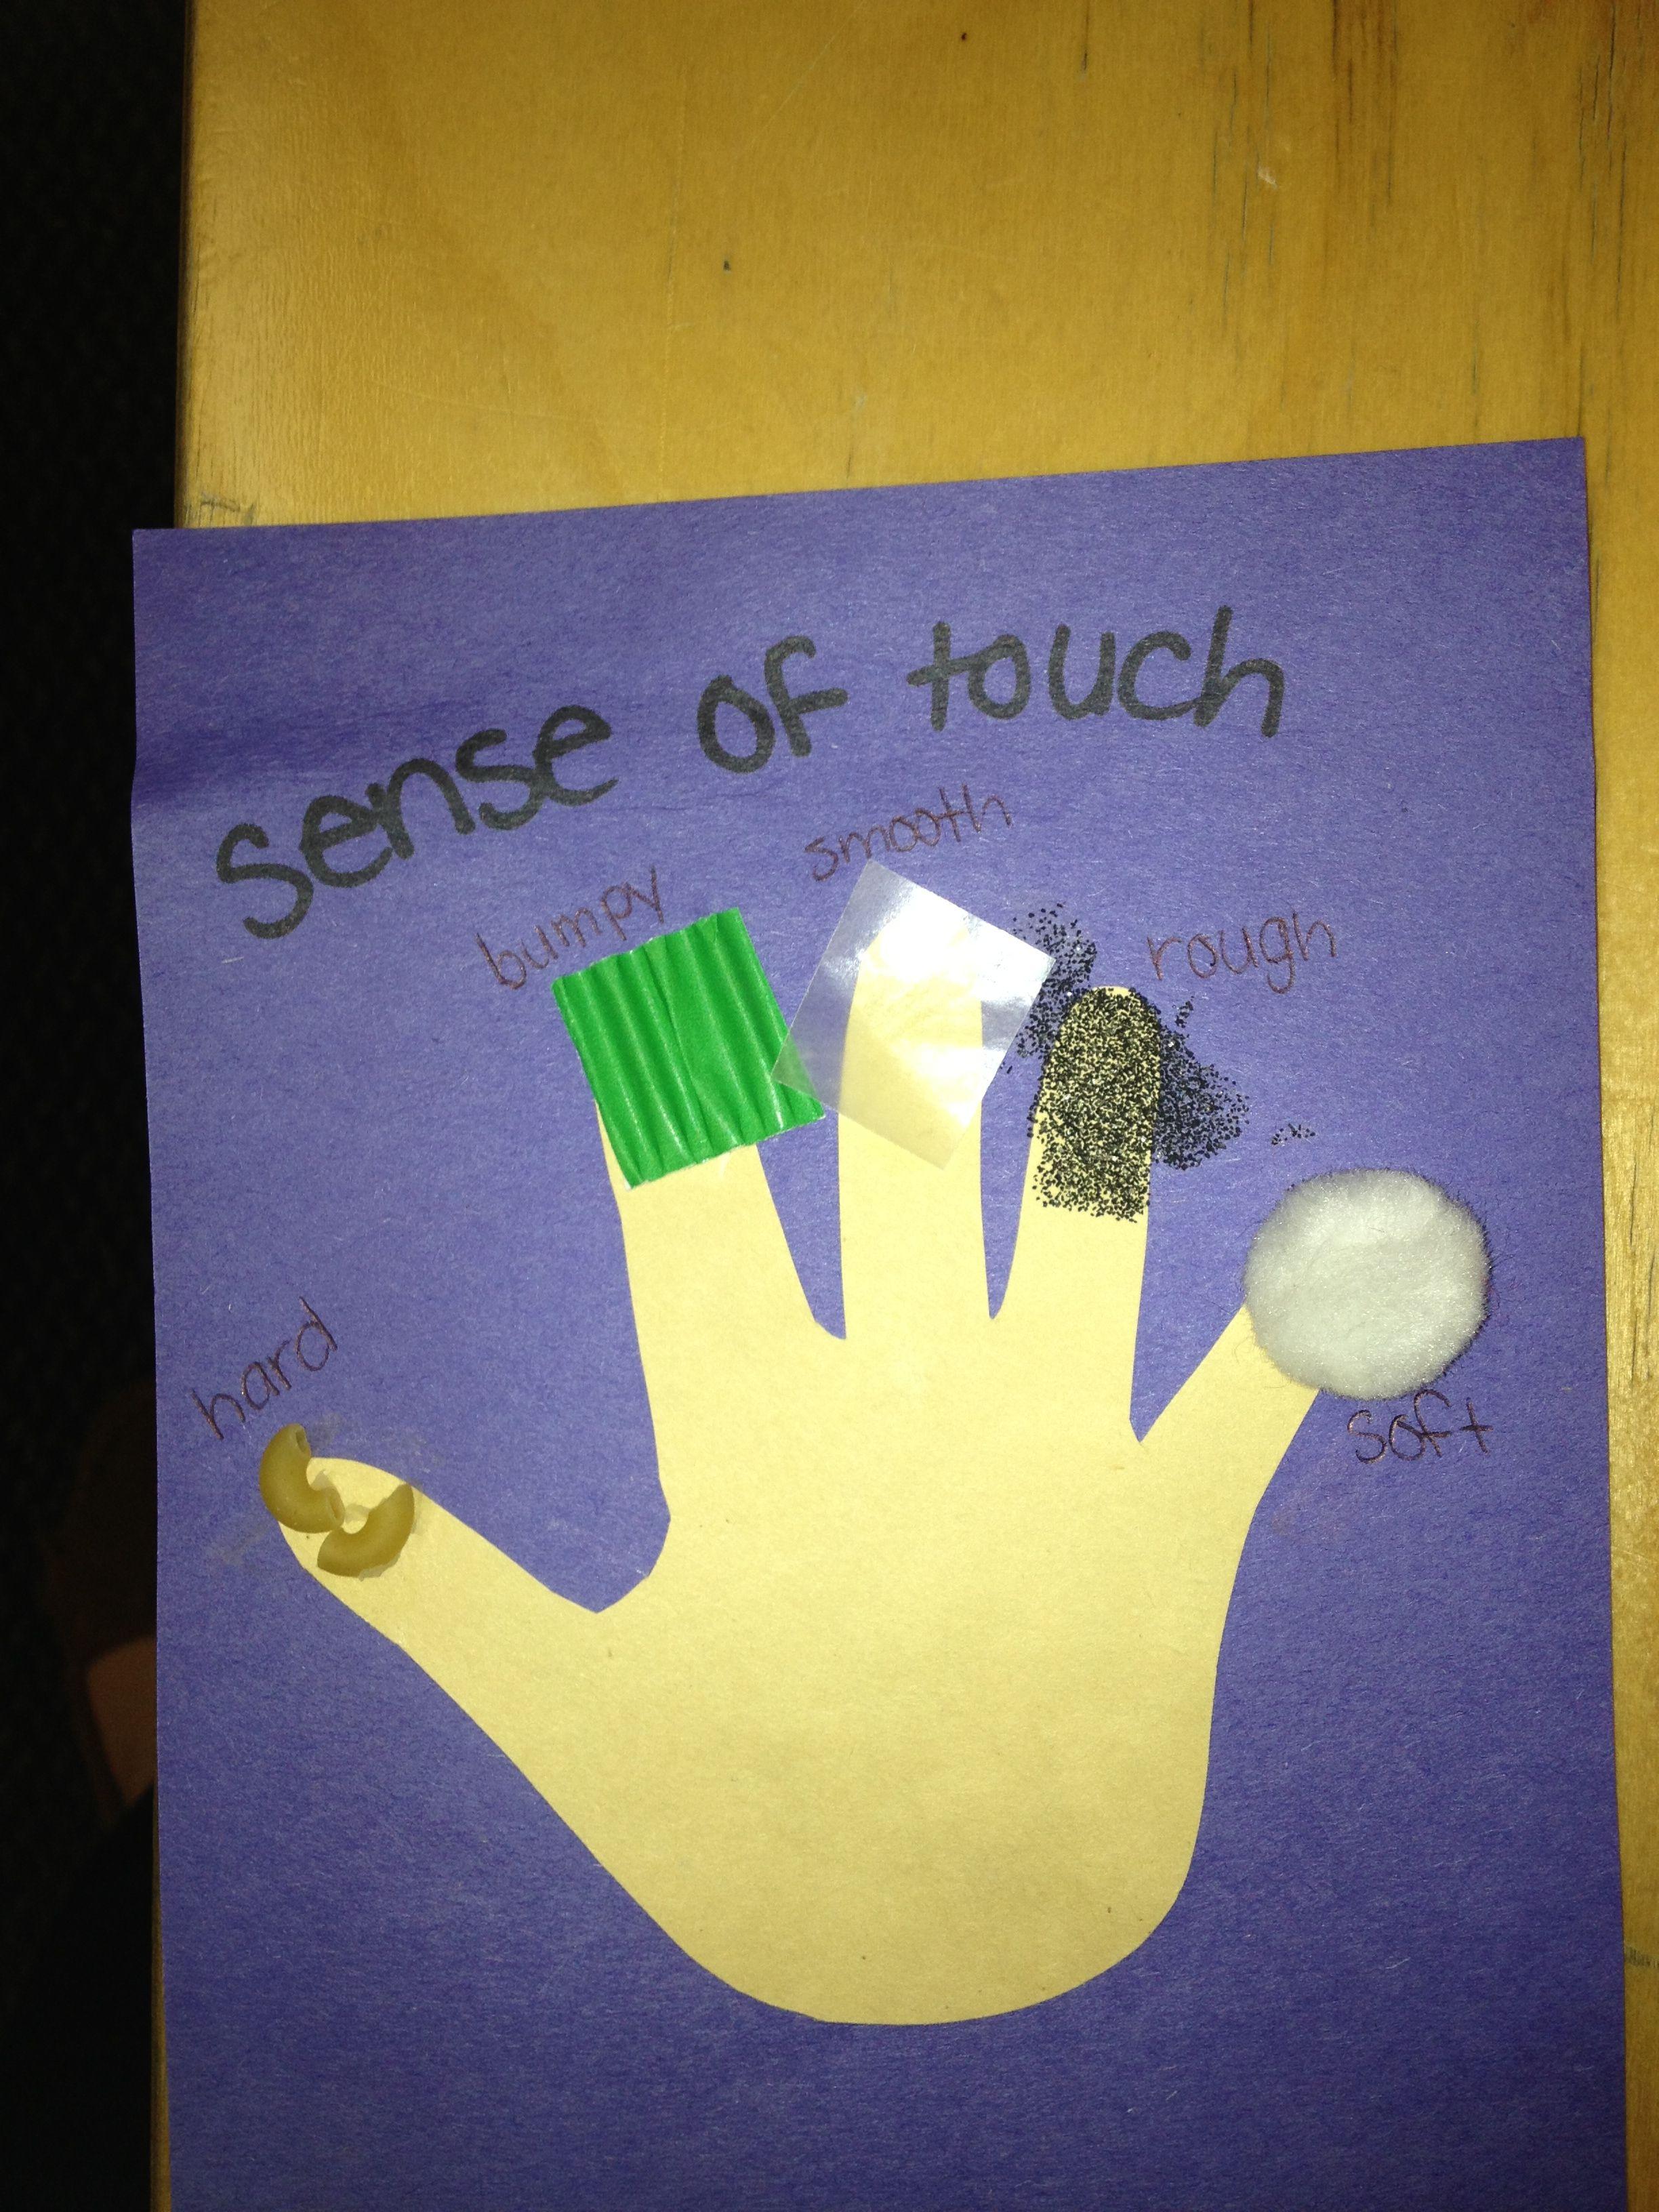 5 Senses Craft All Different Textures Etc On Each Finger Sand Foil Etc